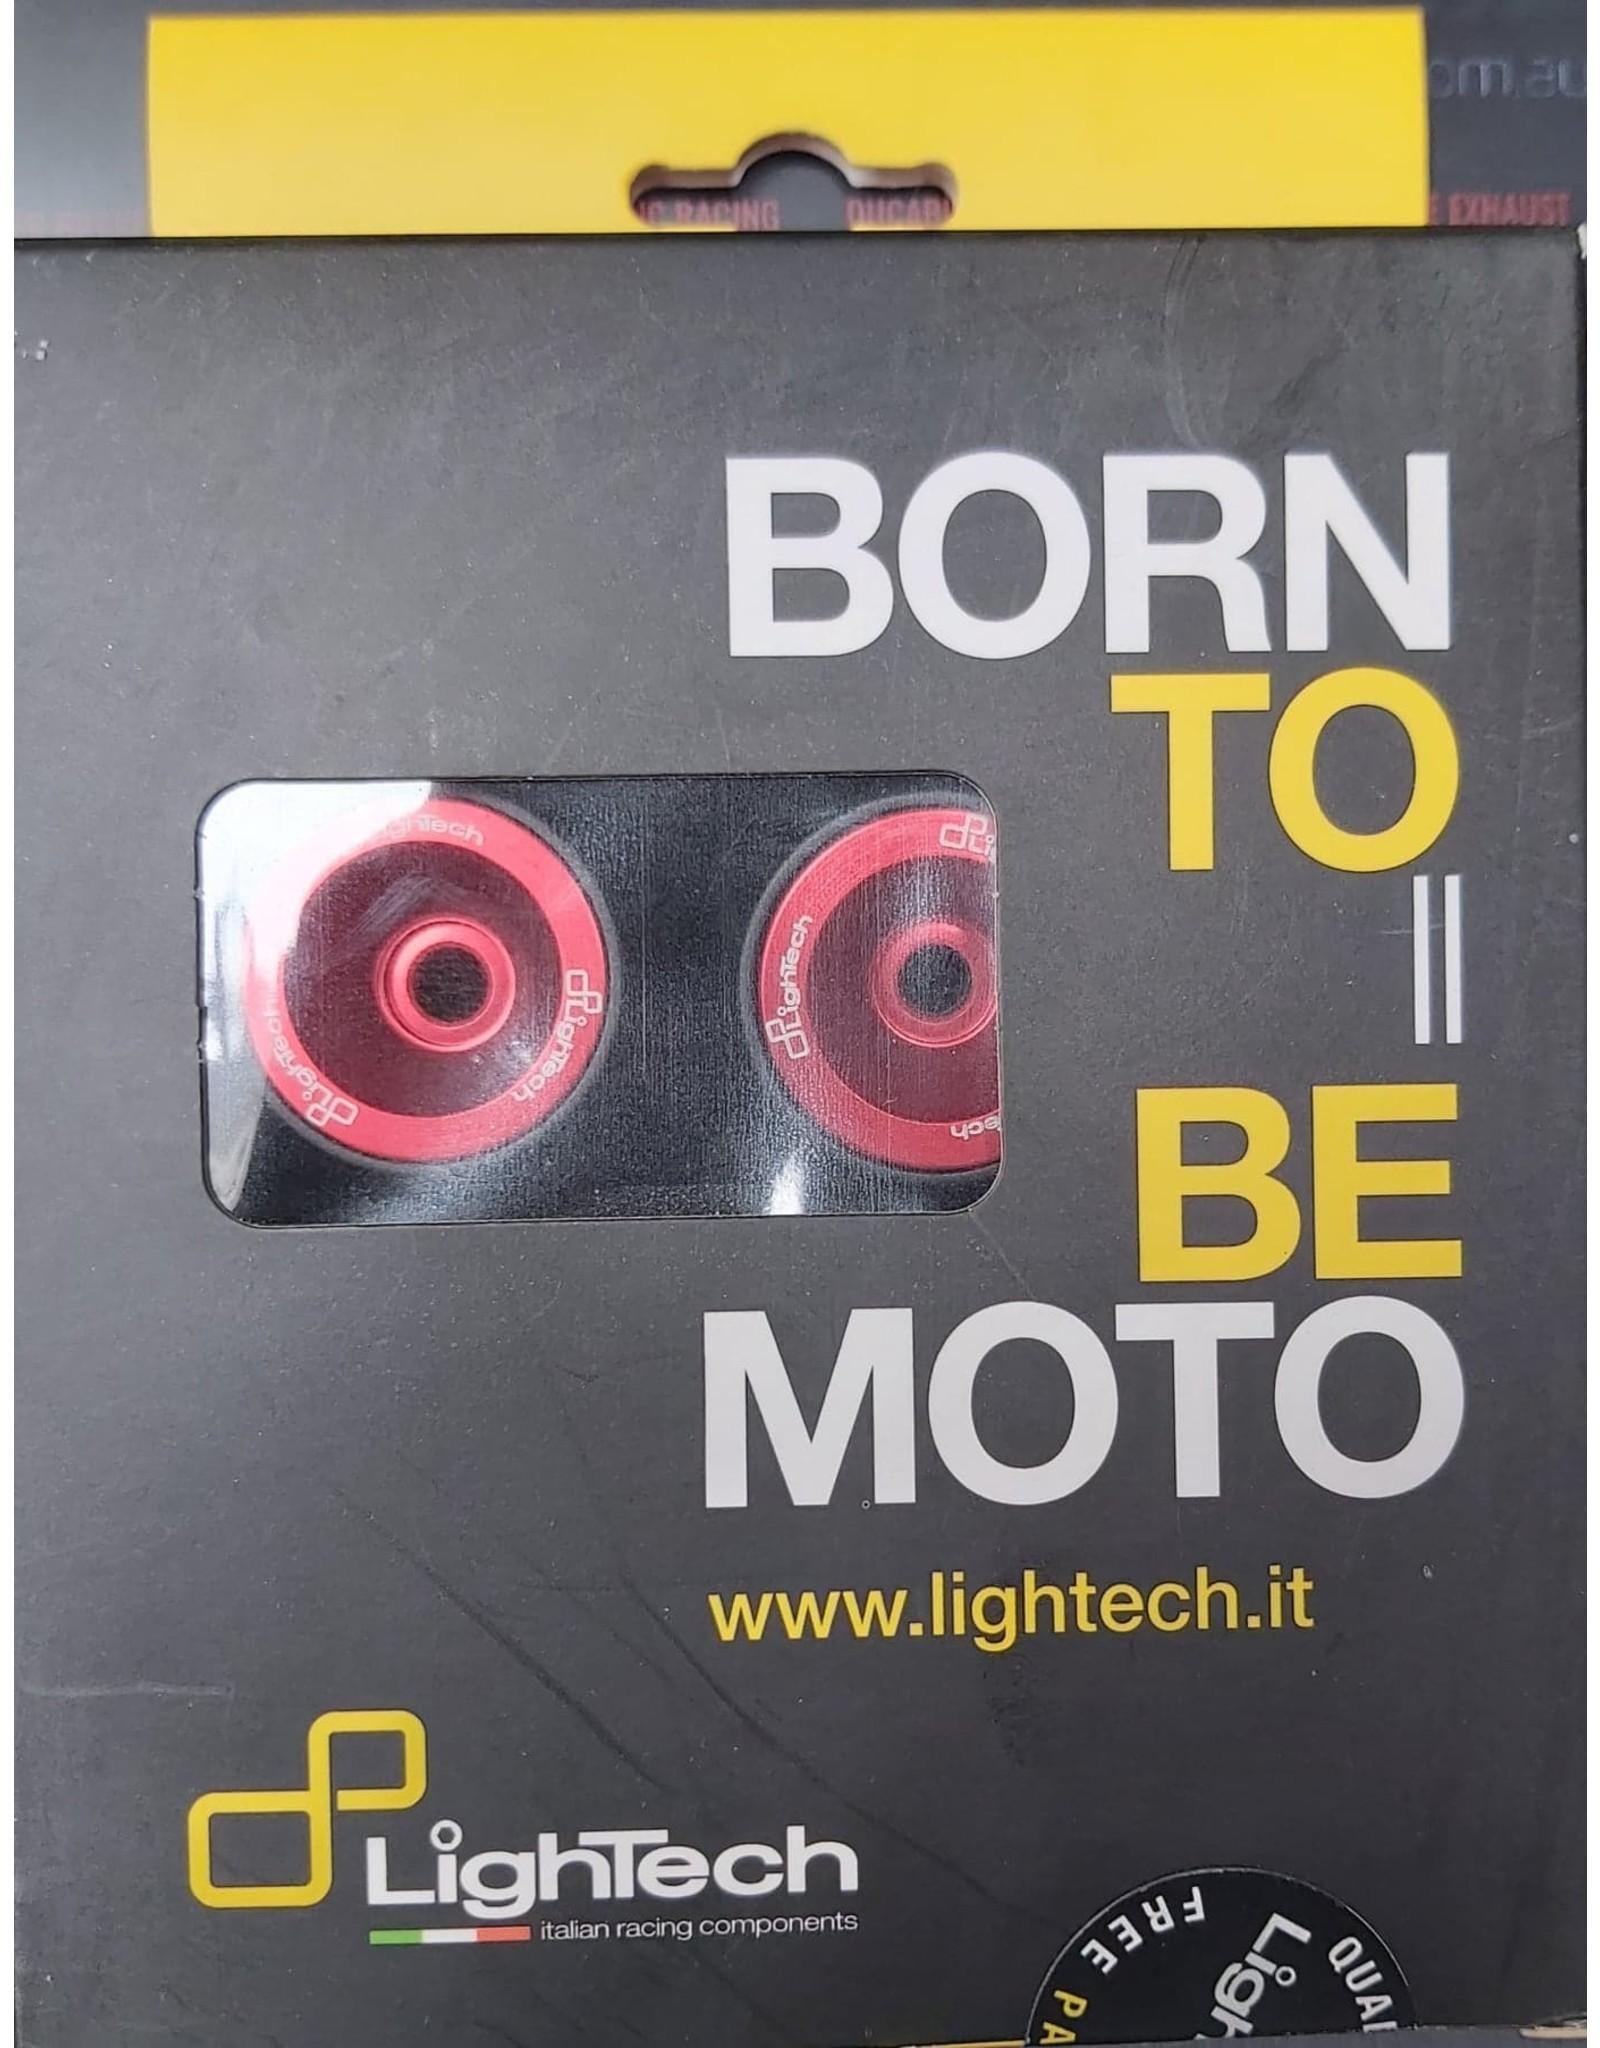 LIGHTECH LIGHTECH FRONT WHEEL AXLE PROTECTION FOR DUCATI SF 848 PART ARDU102